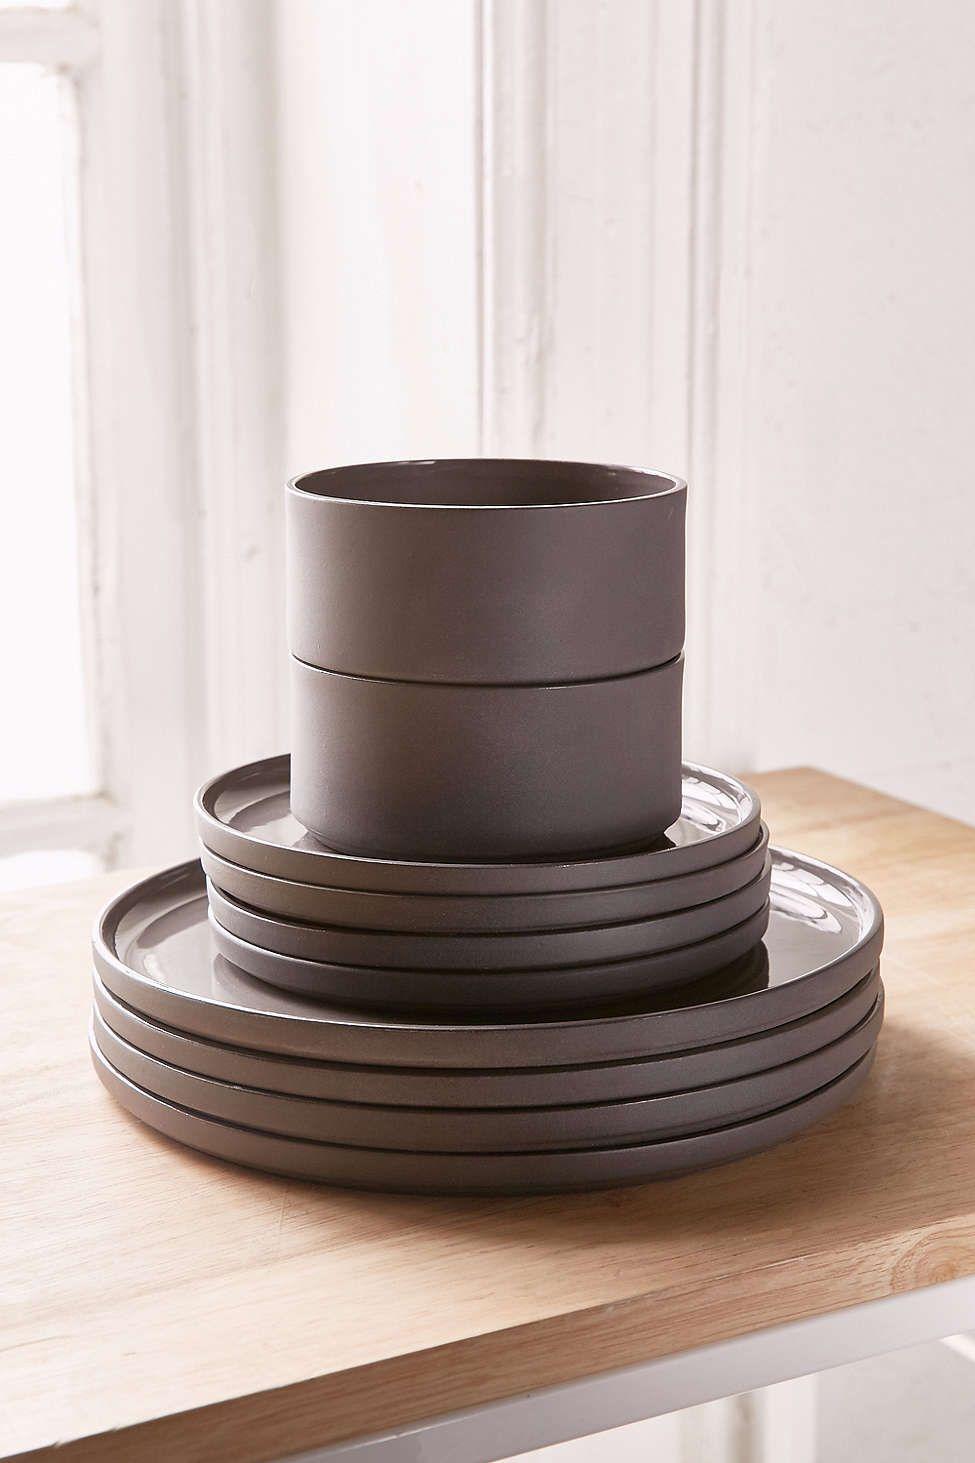 12 piece modern dinnerware set - Modern Dinnerware